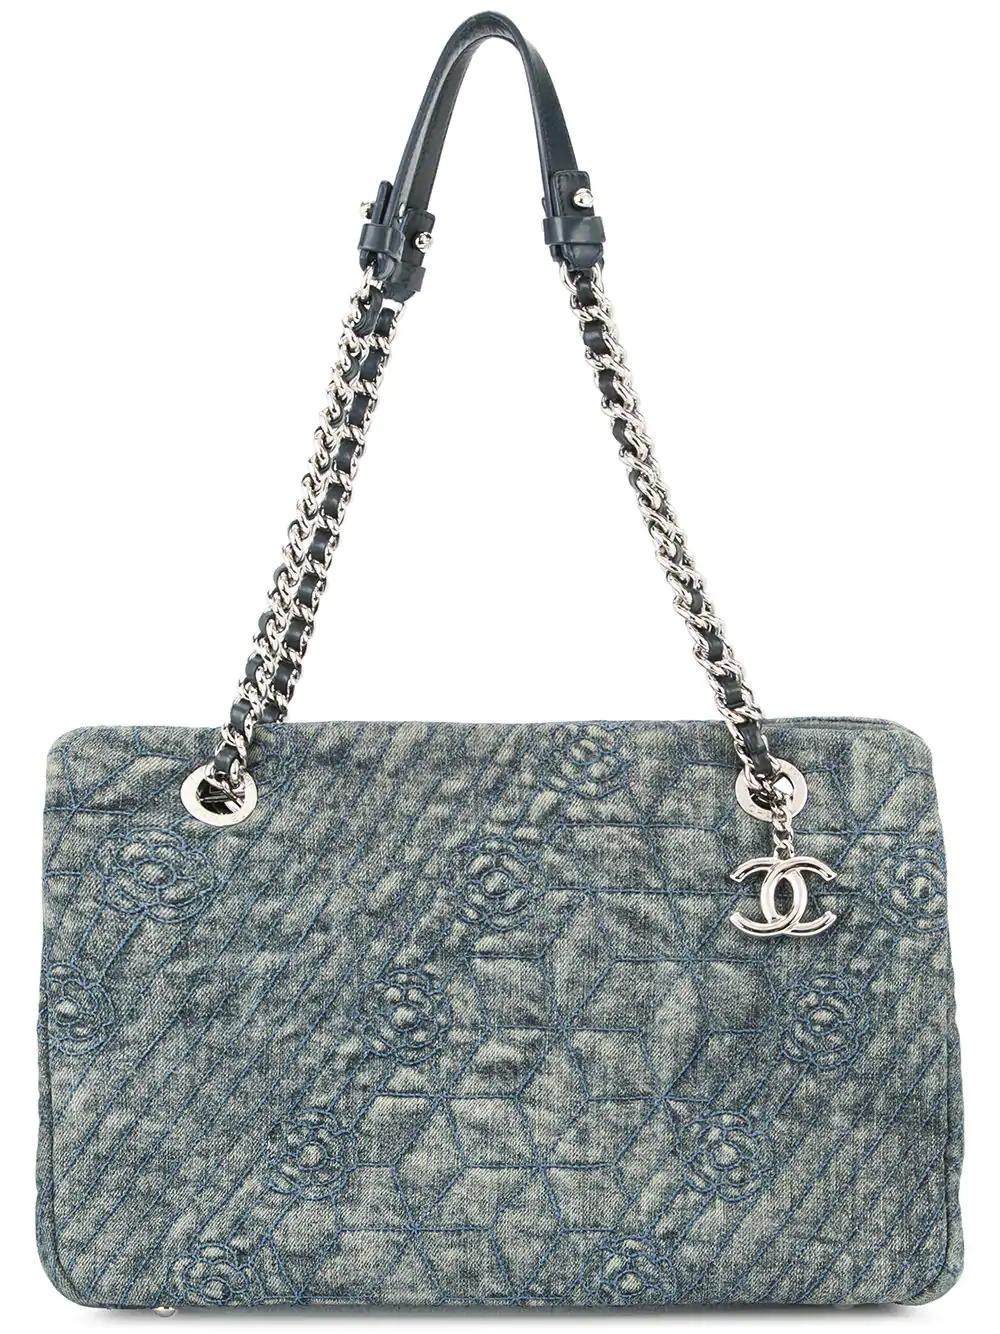 c17edafd9c07 Chanel Vintage Camellia Stitch Shoulder Bag - Blue | ModeSens